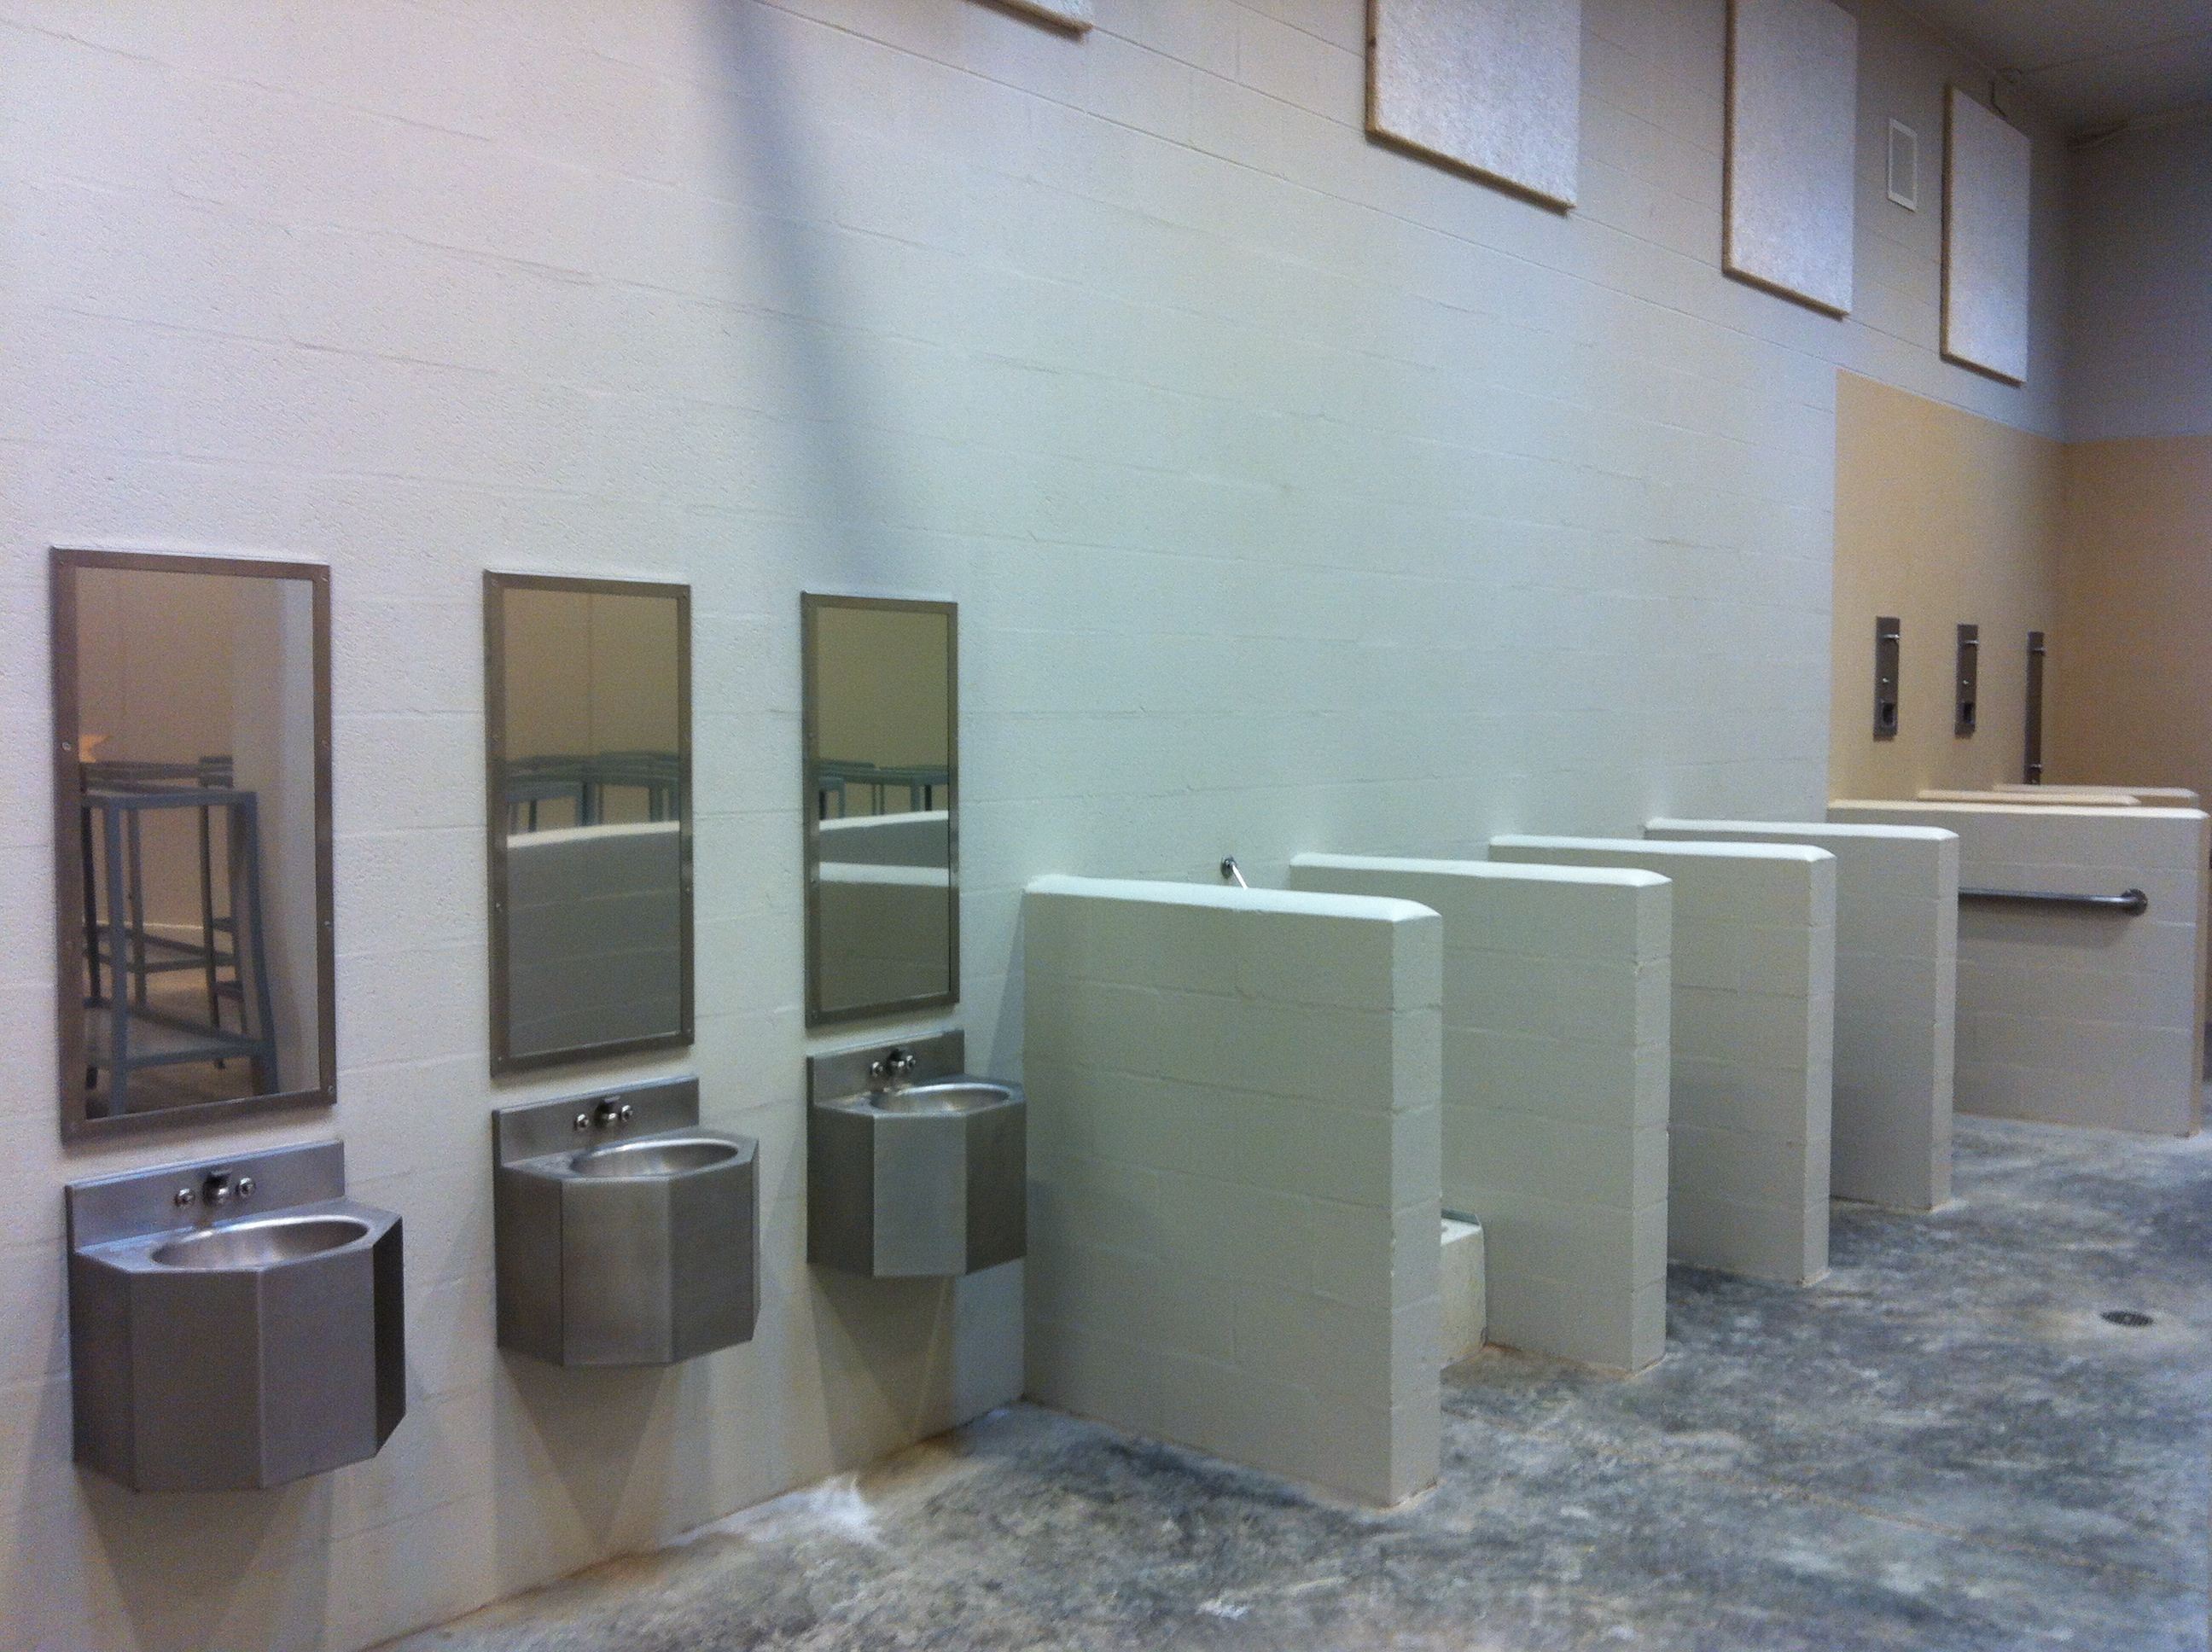 Barham cain mynatt inc institutional projects for Bathroom remodel jackson tn